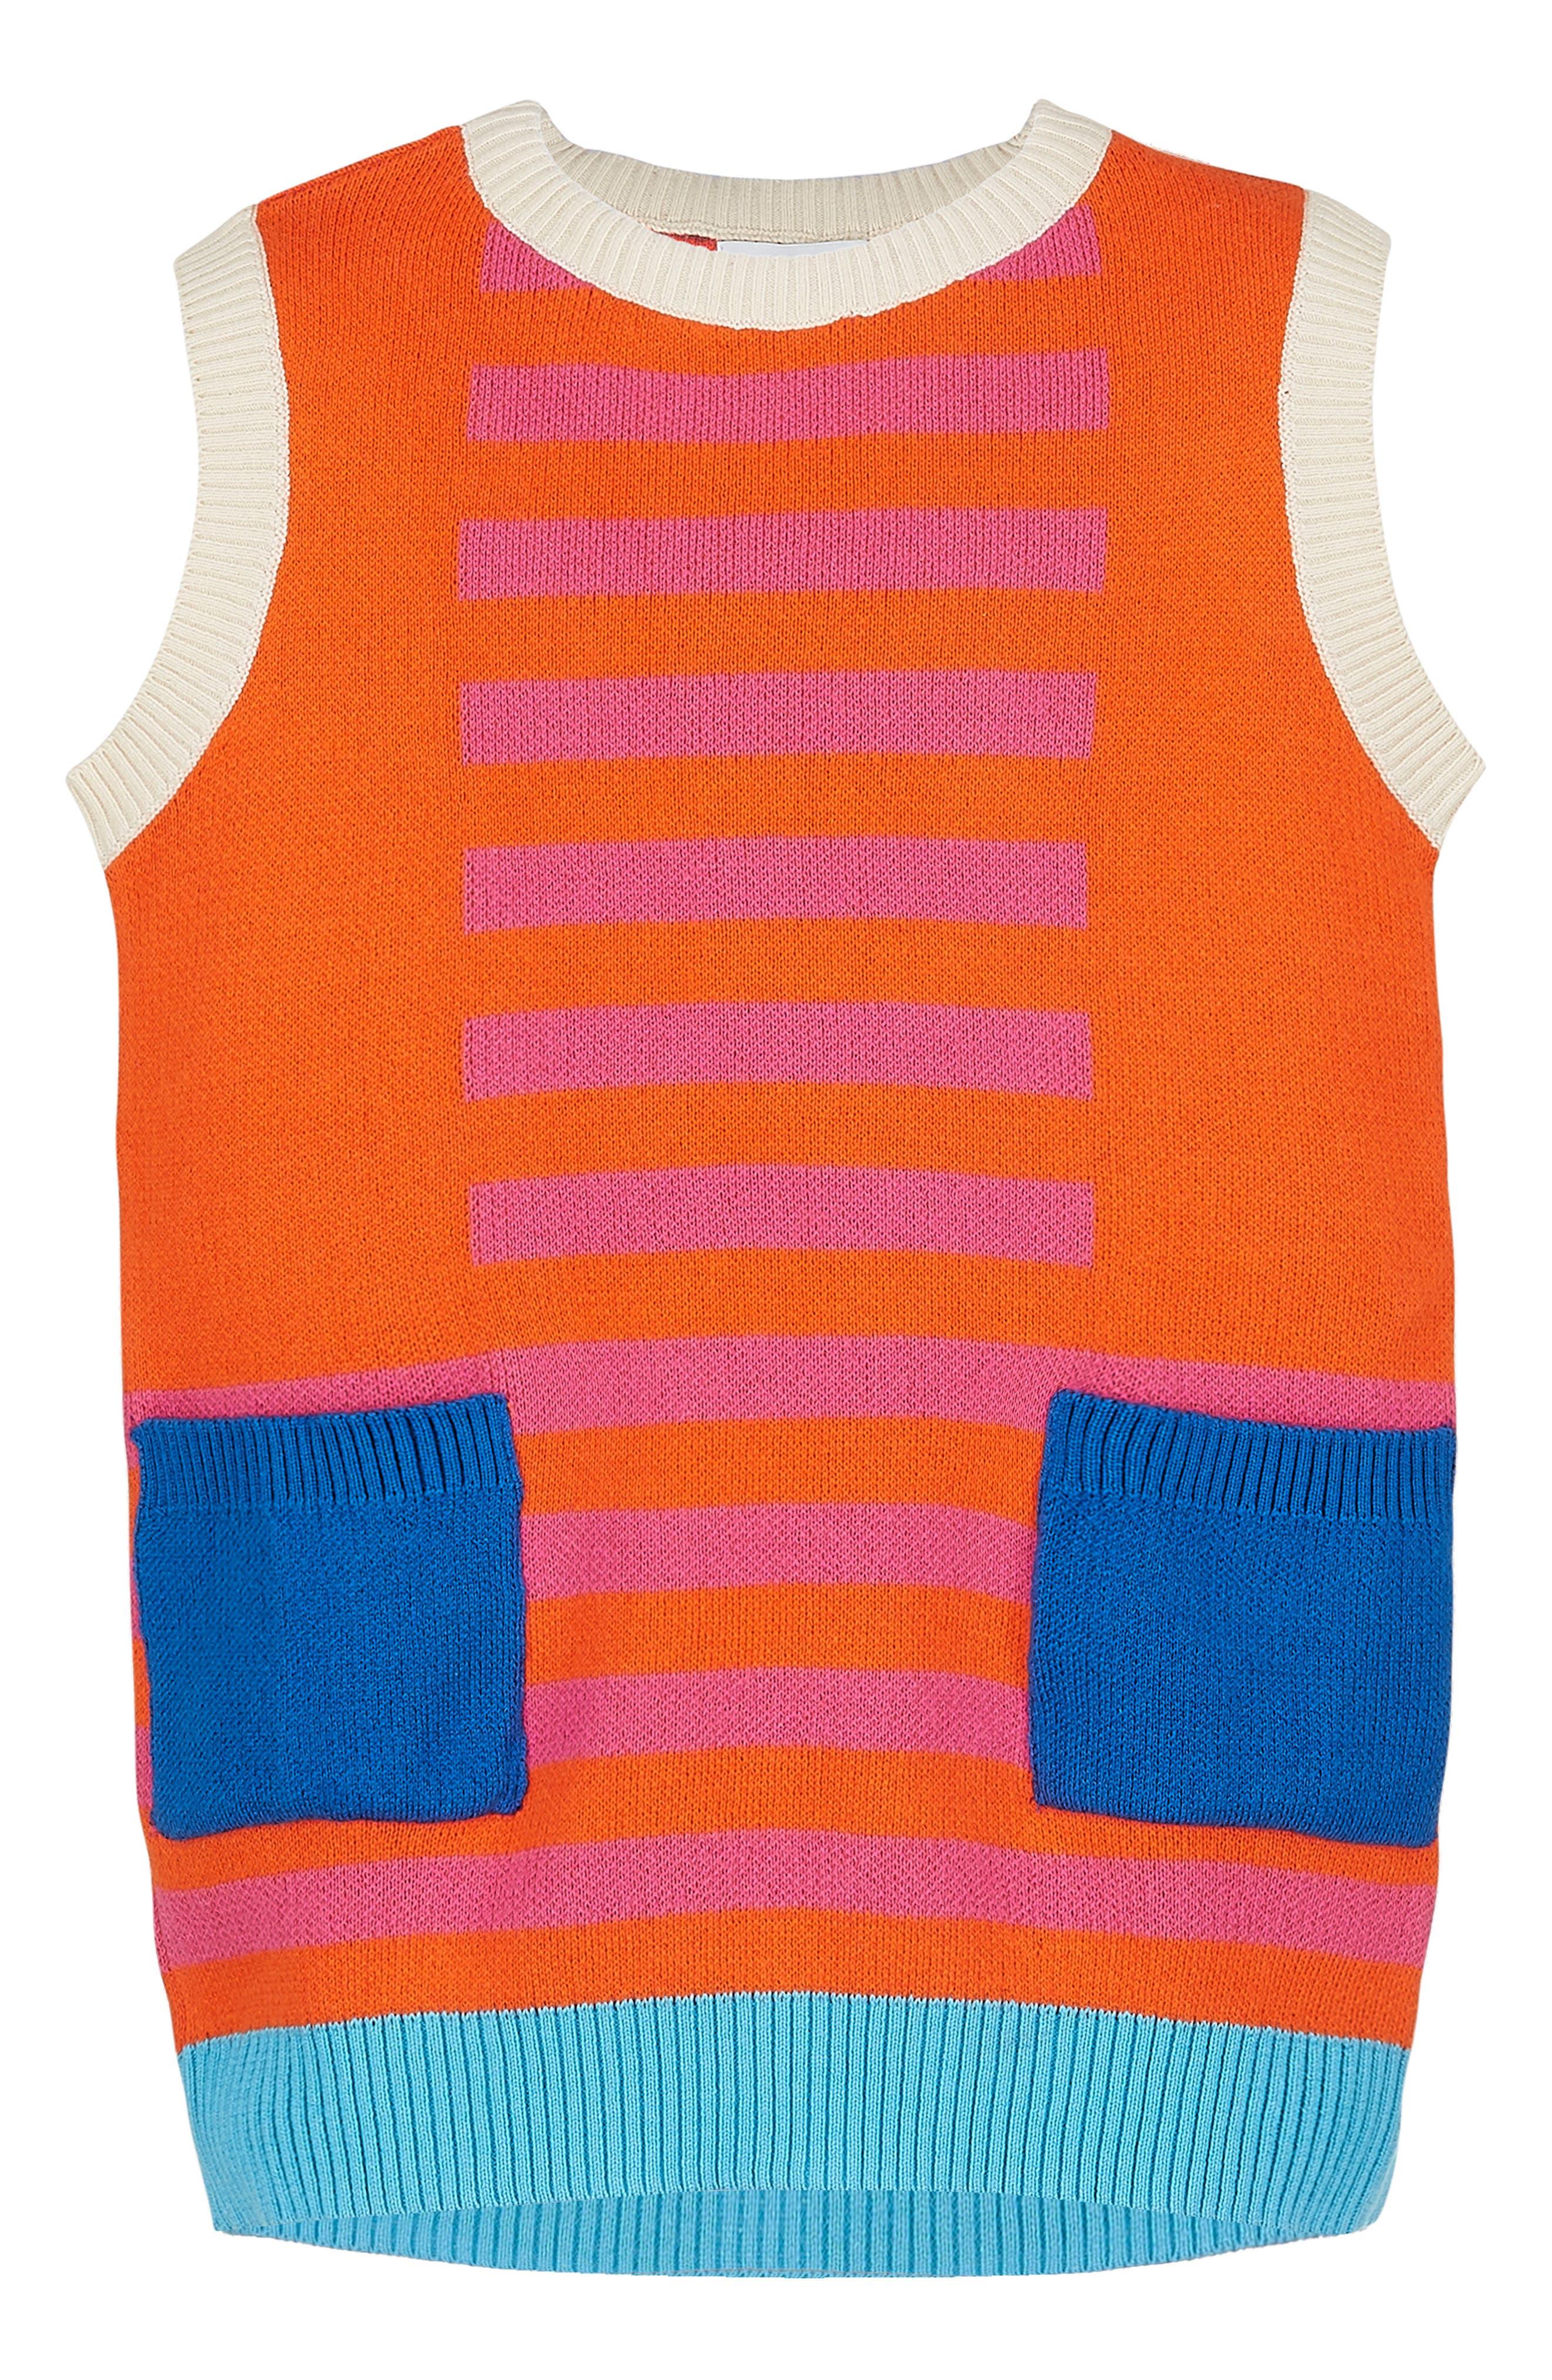 Main Image - Margherita Retro Colorblock Sweater Knit Dress (Toddler Girls & Little Girls)